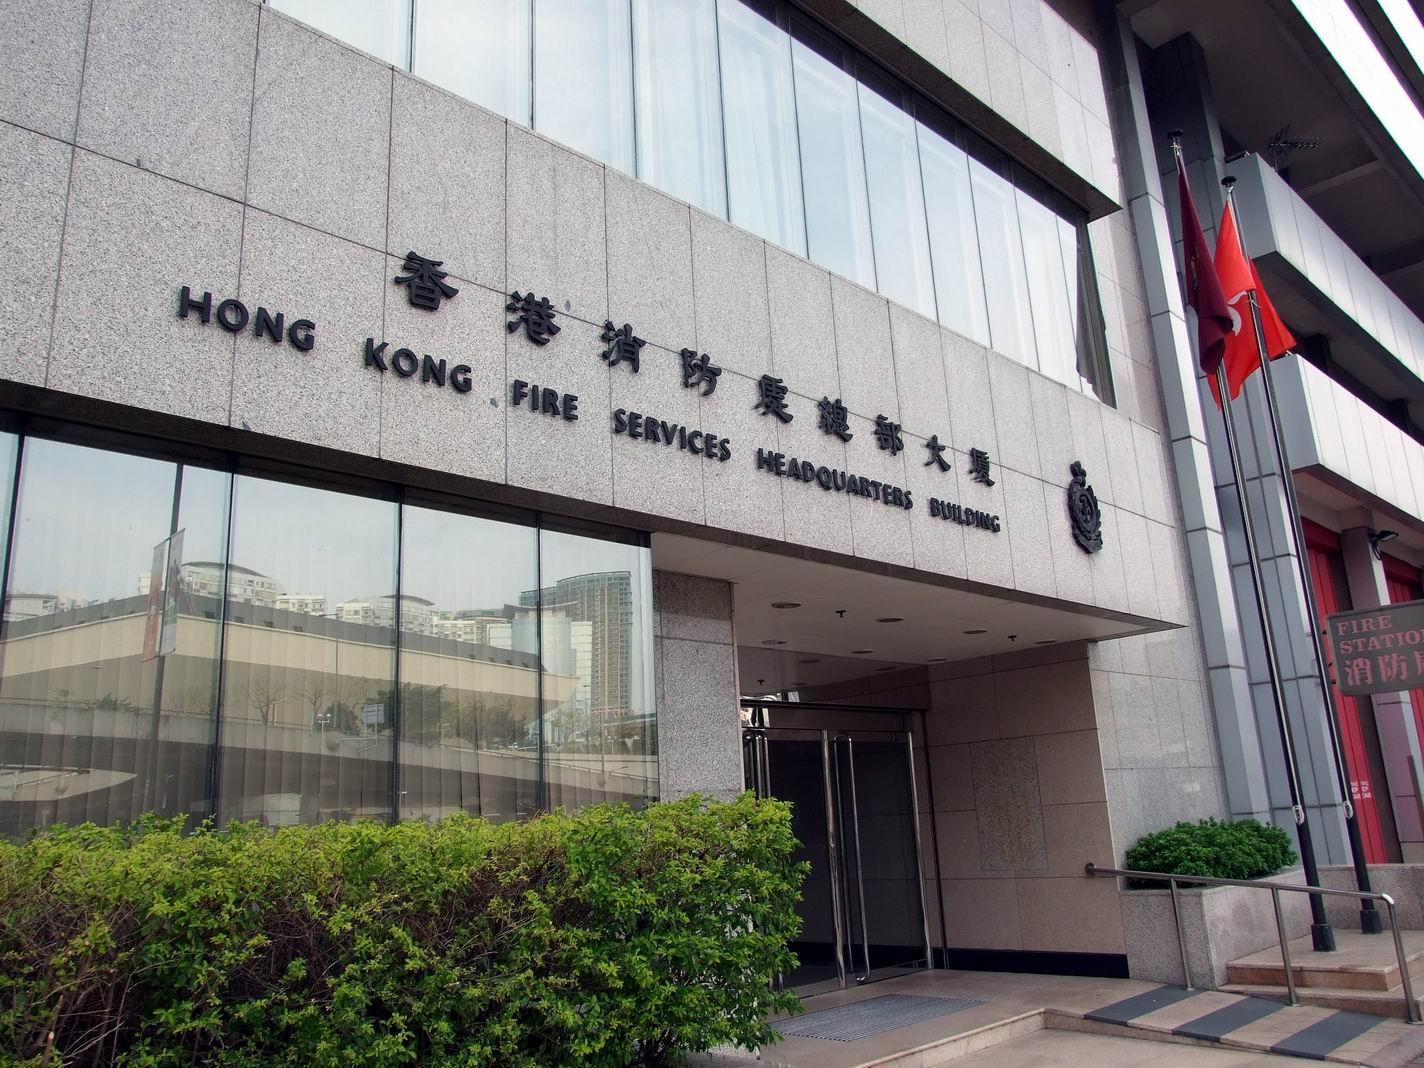 Hong Kong Fire Services Department - Wikipedia